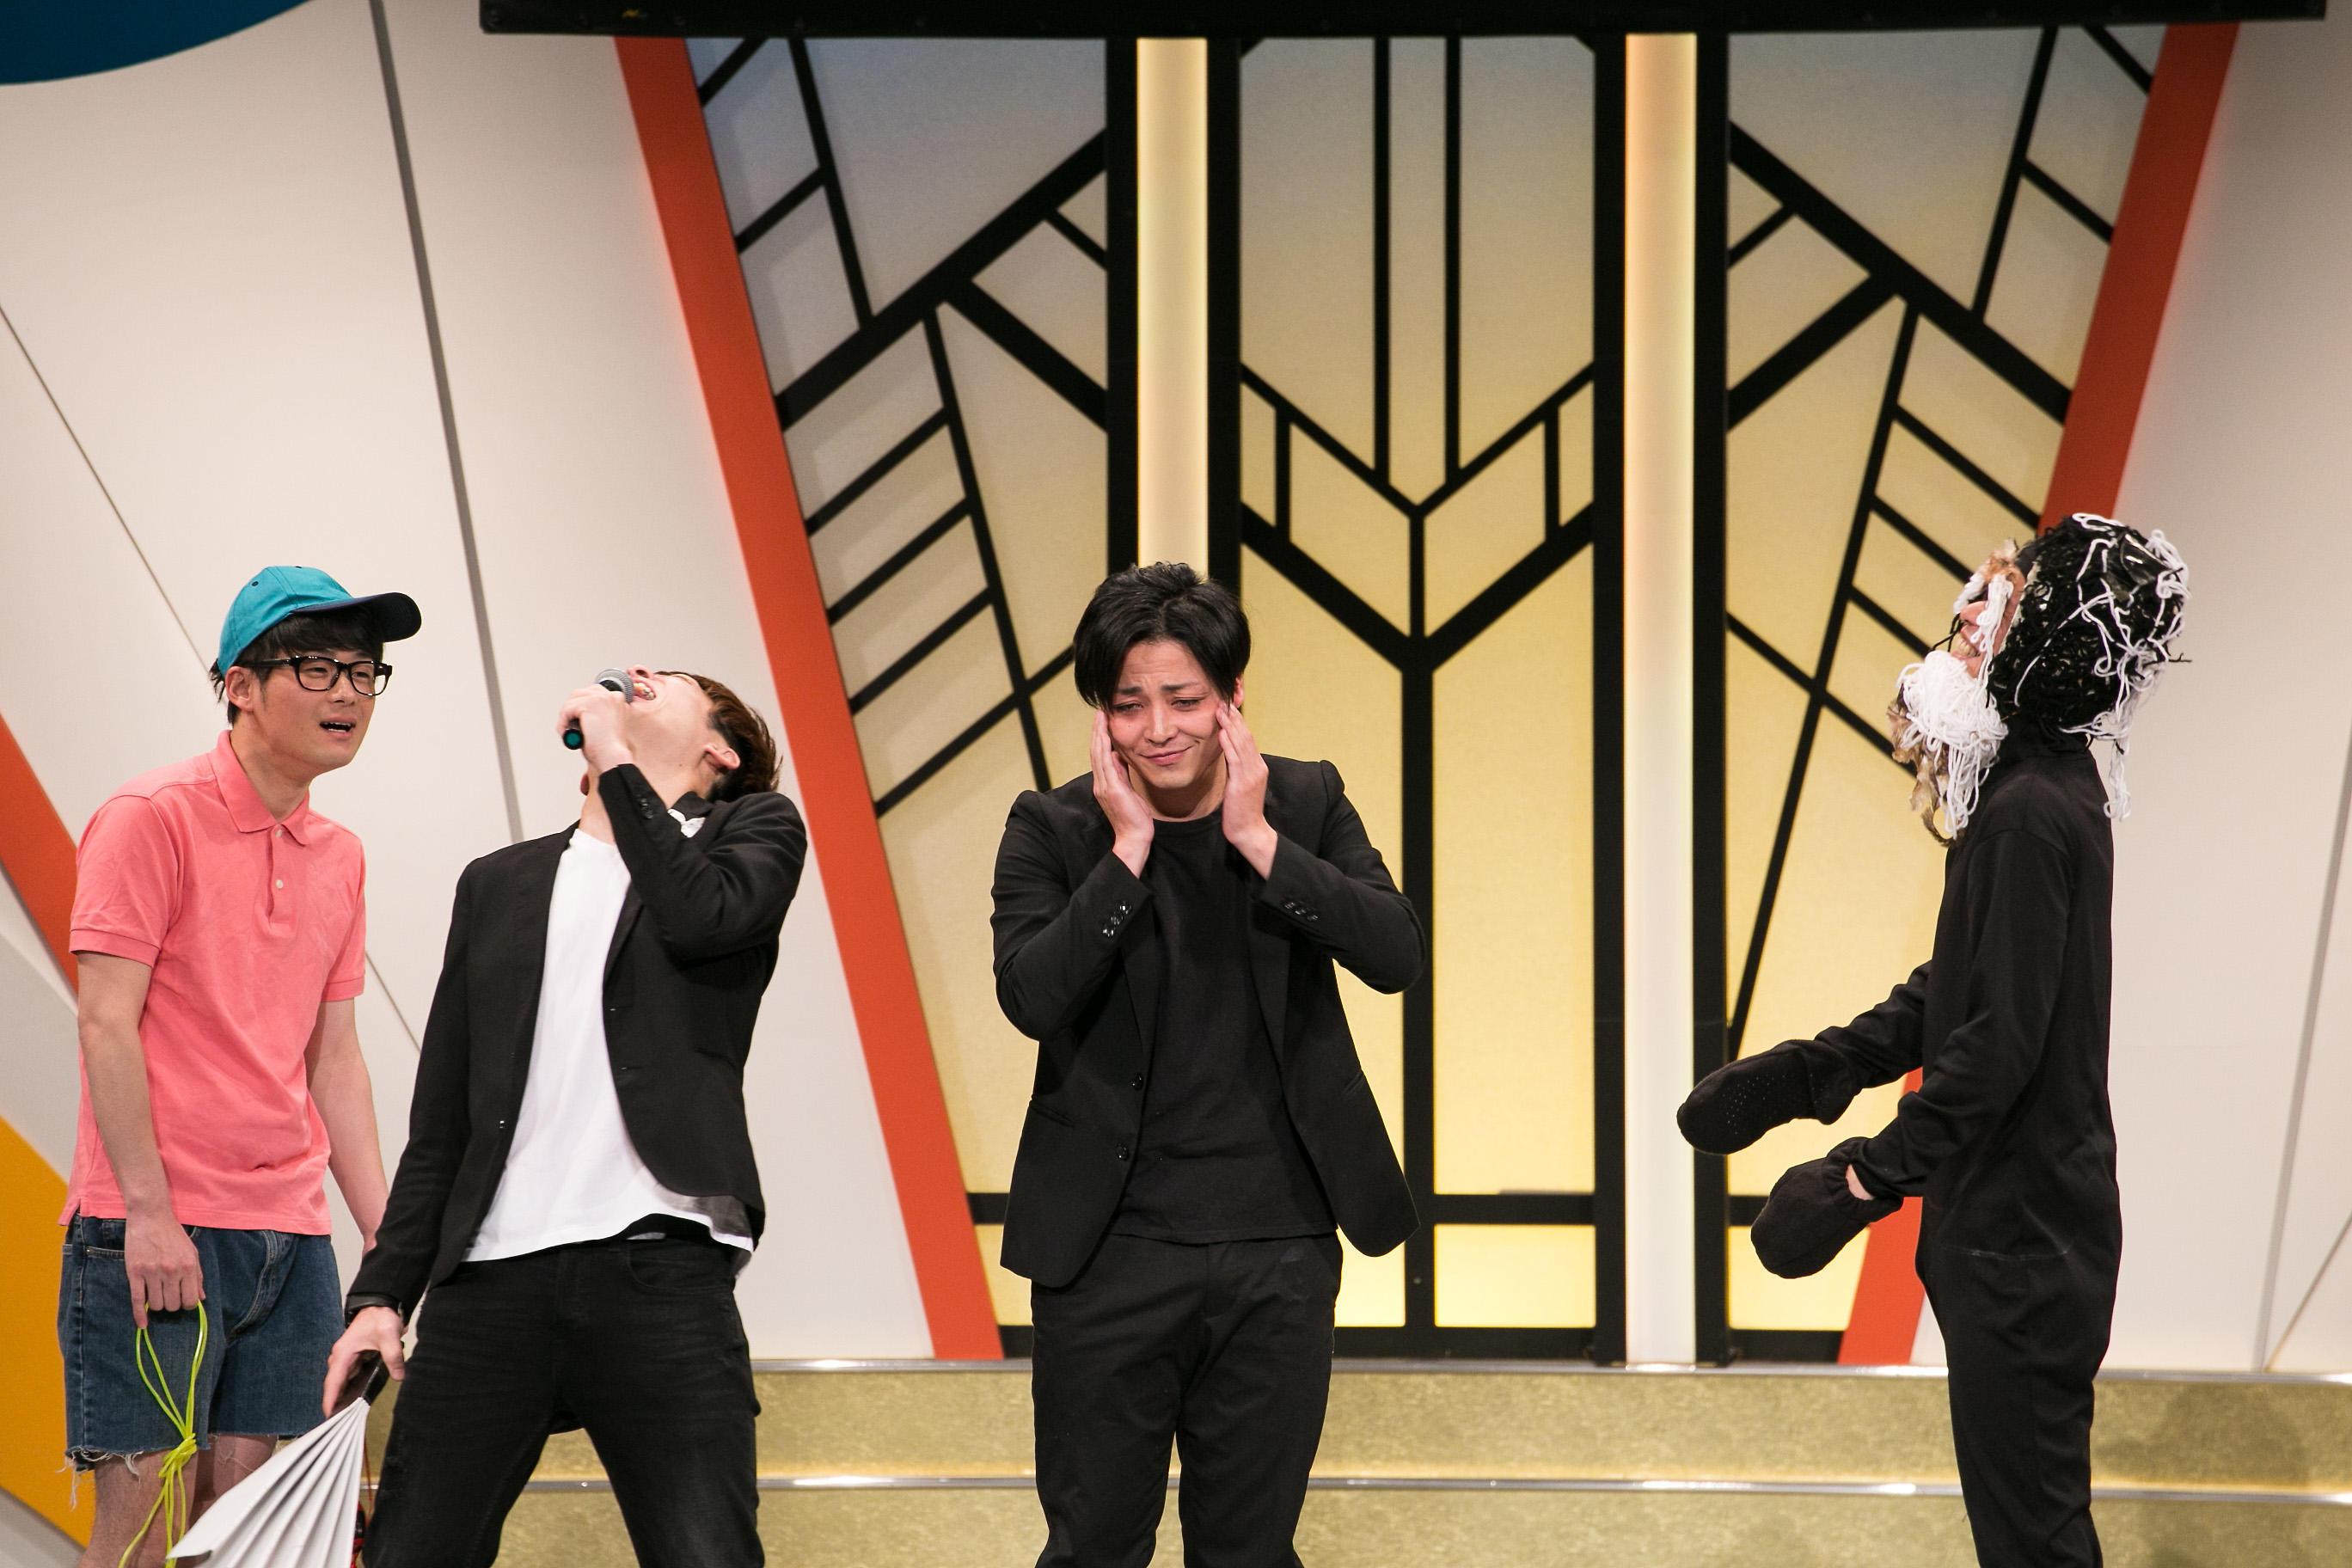 http://news.yoshimoto.co.jp/20171205220732-e042ac950264da35c6c883b59287e40dee7a6c4a.jpg